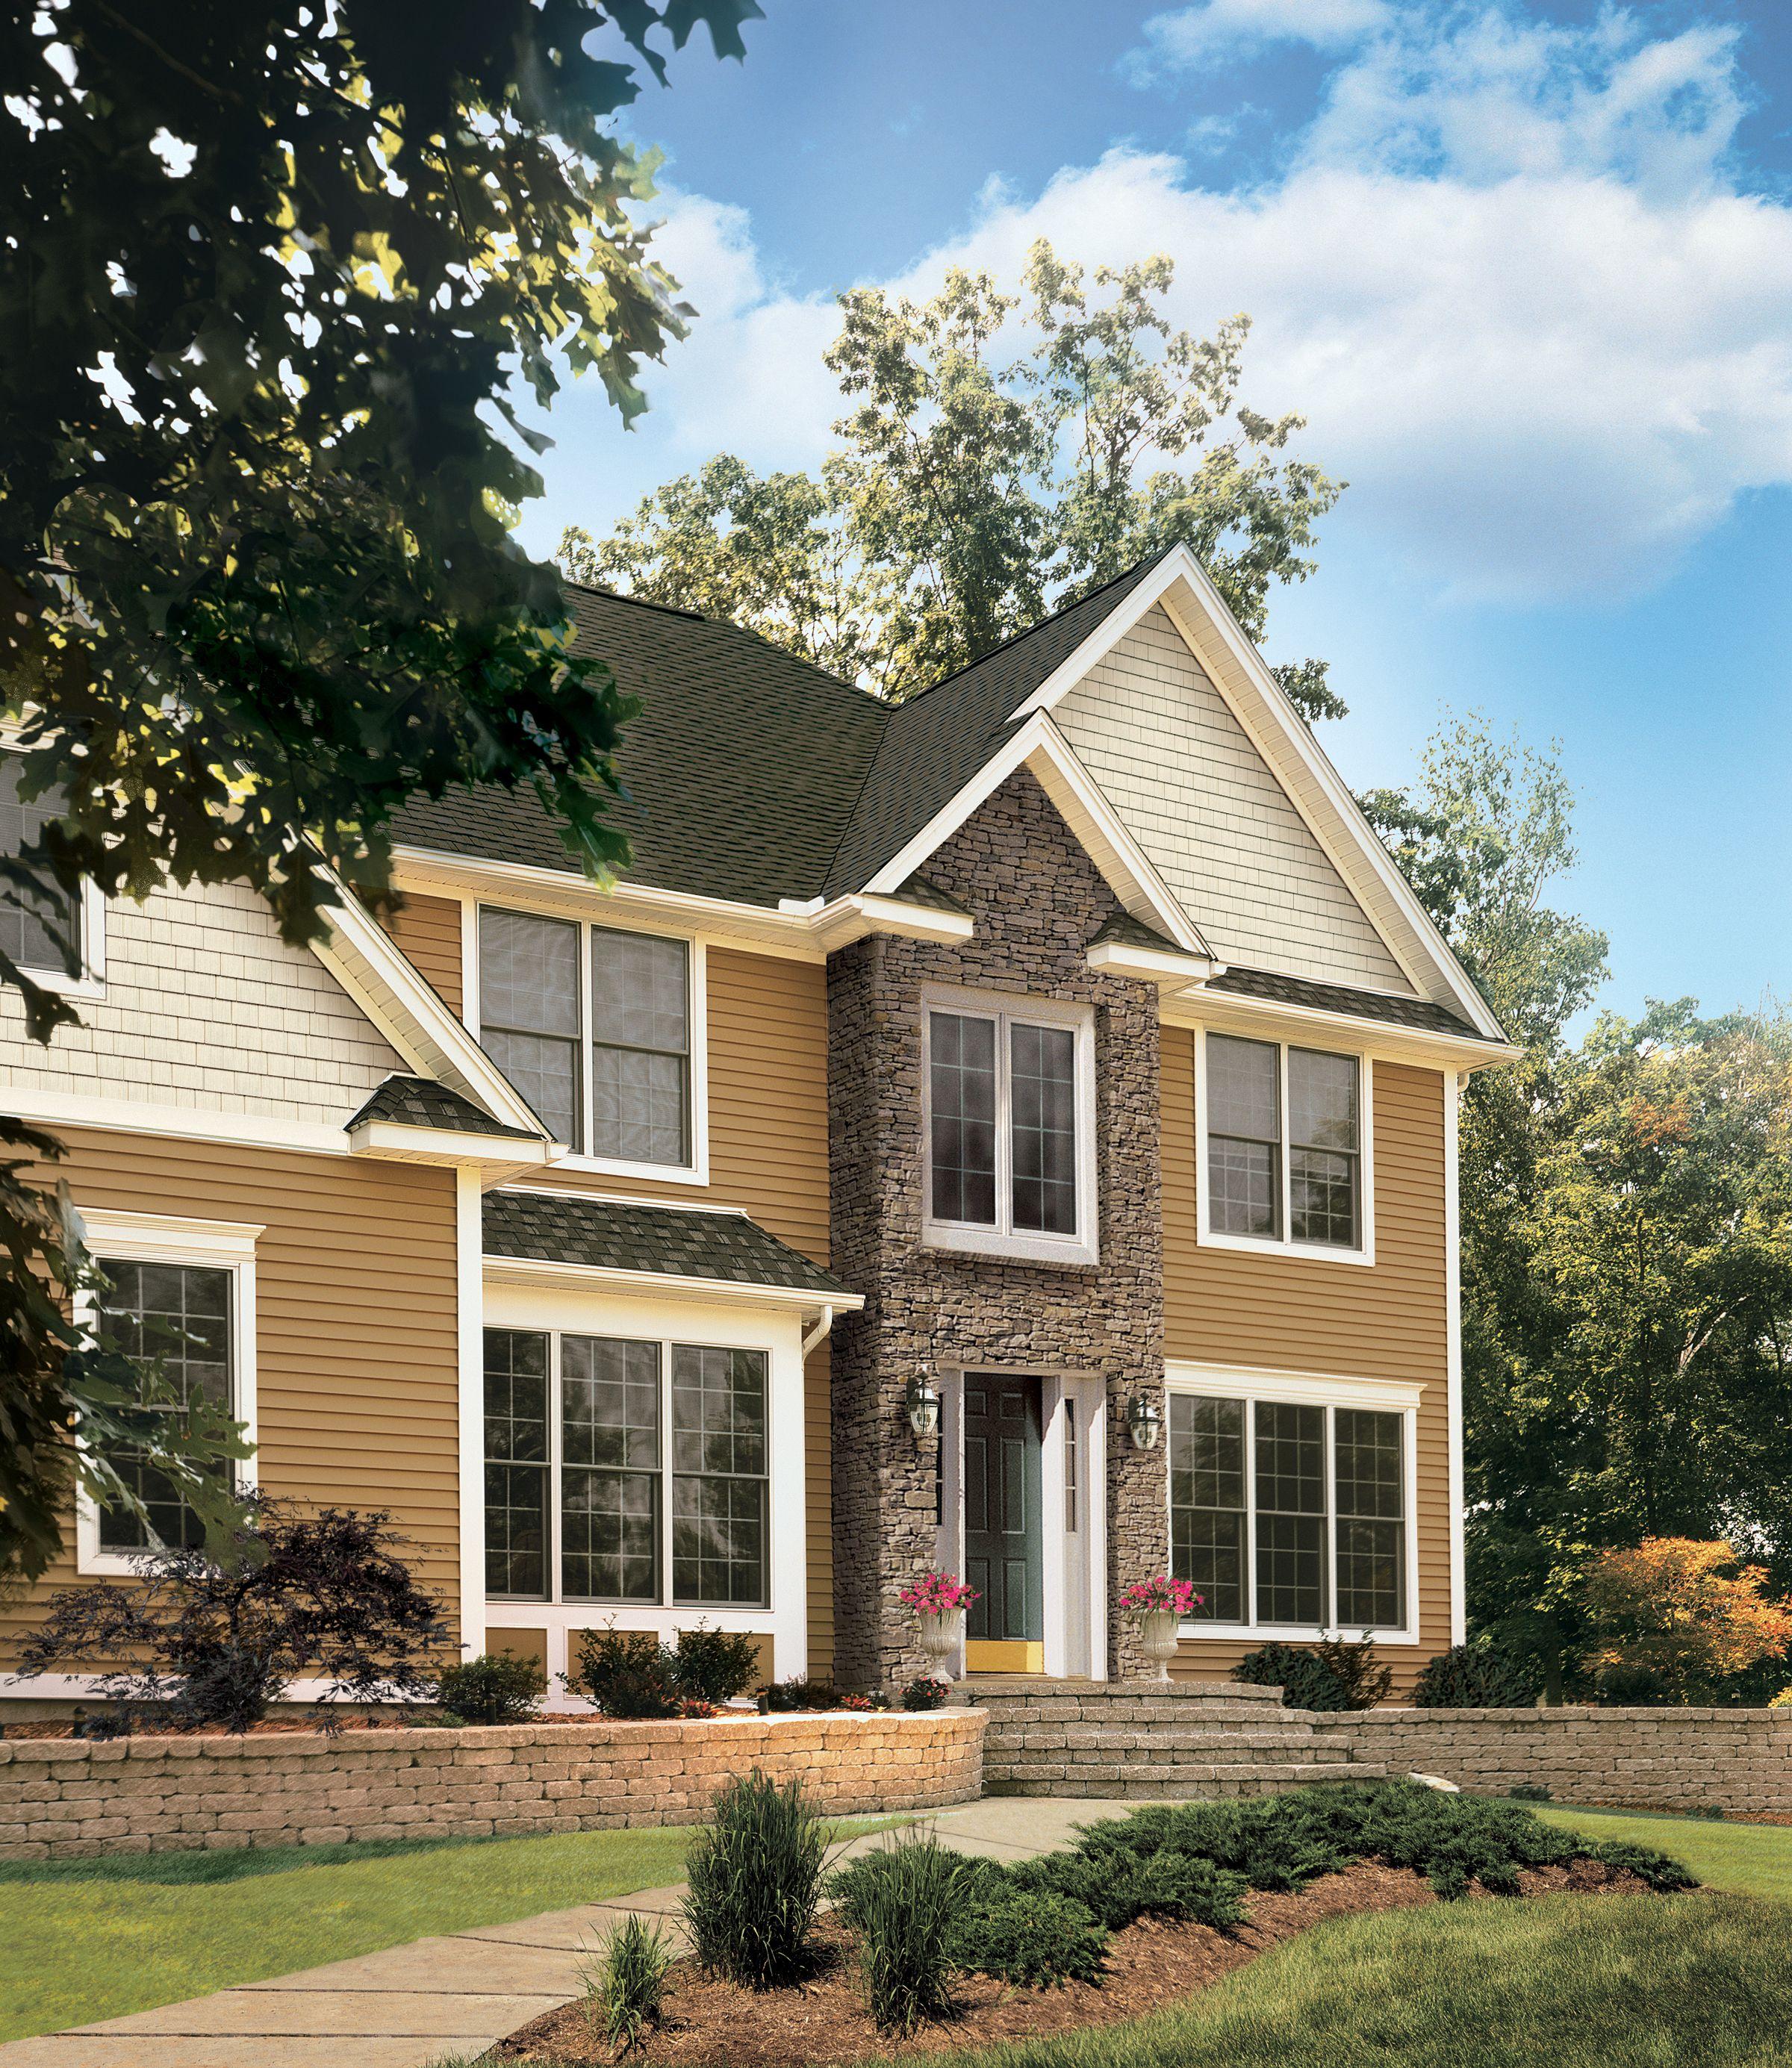 Certainteed Siding Monogram Mountain Cedar Sandstone Beige Certainteed Siding House Exterior Roofing